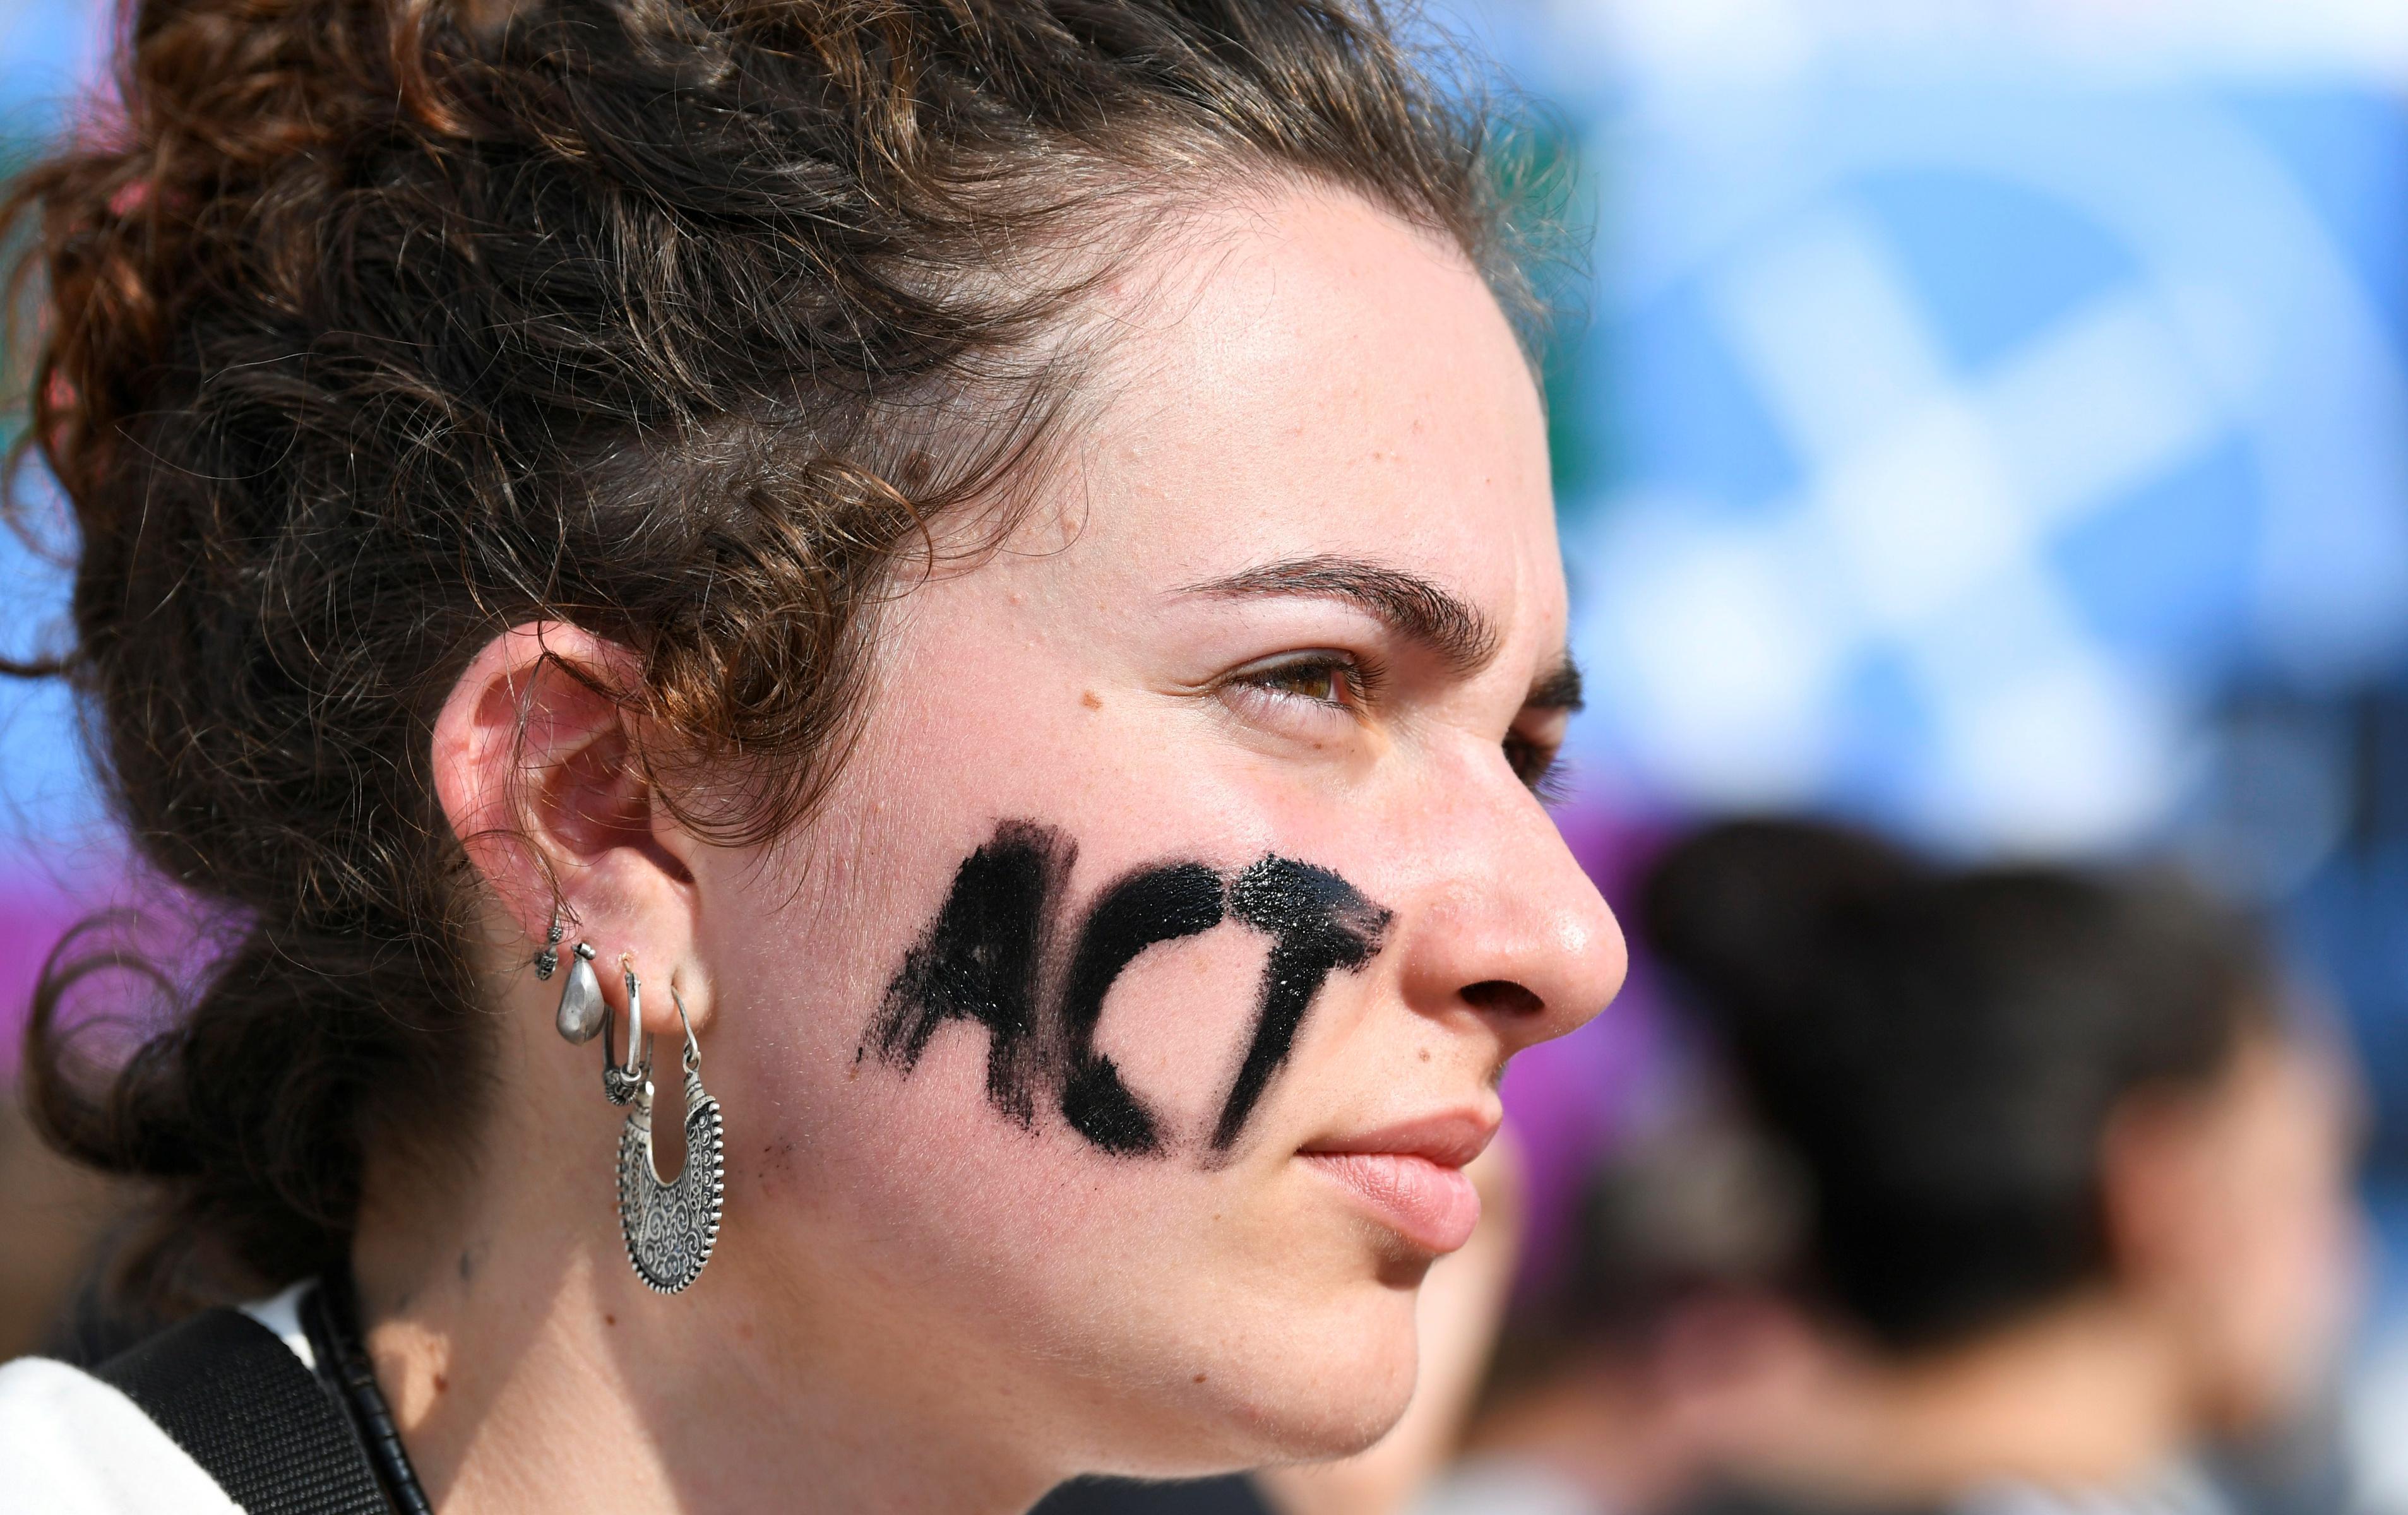 Climate change activists storm red carpet at Venice Film Festival